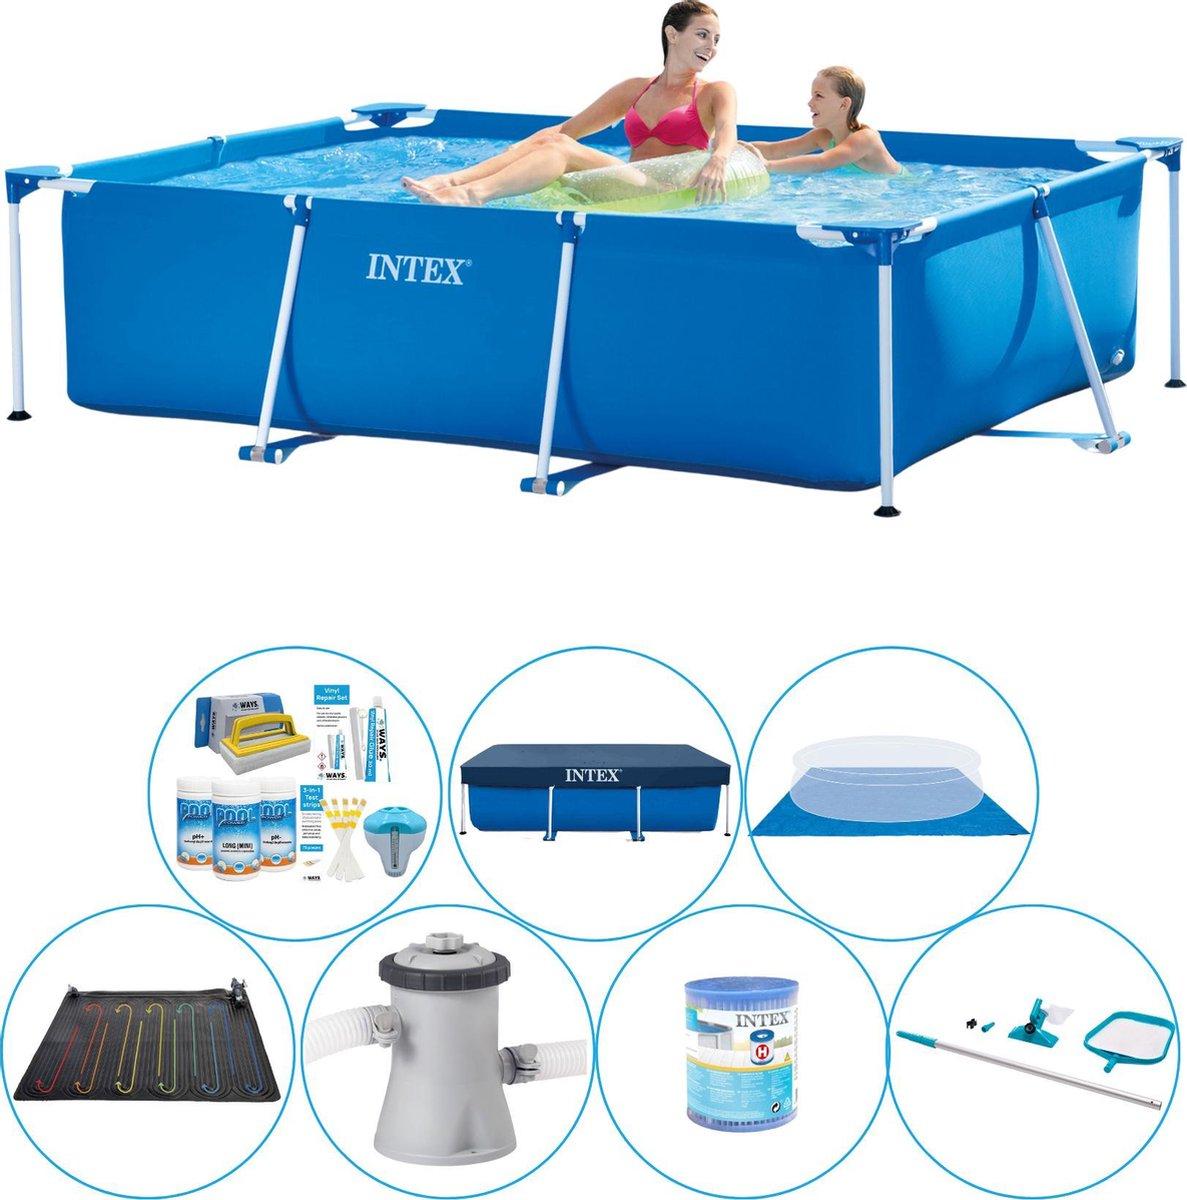 Intex Frame Pool Rechthoekig 220x150x60 cm - Zwembad Pakket